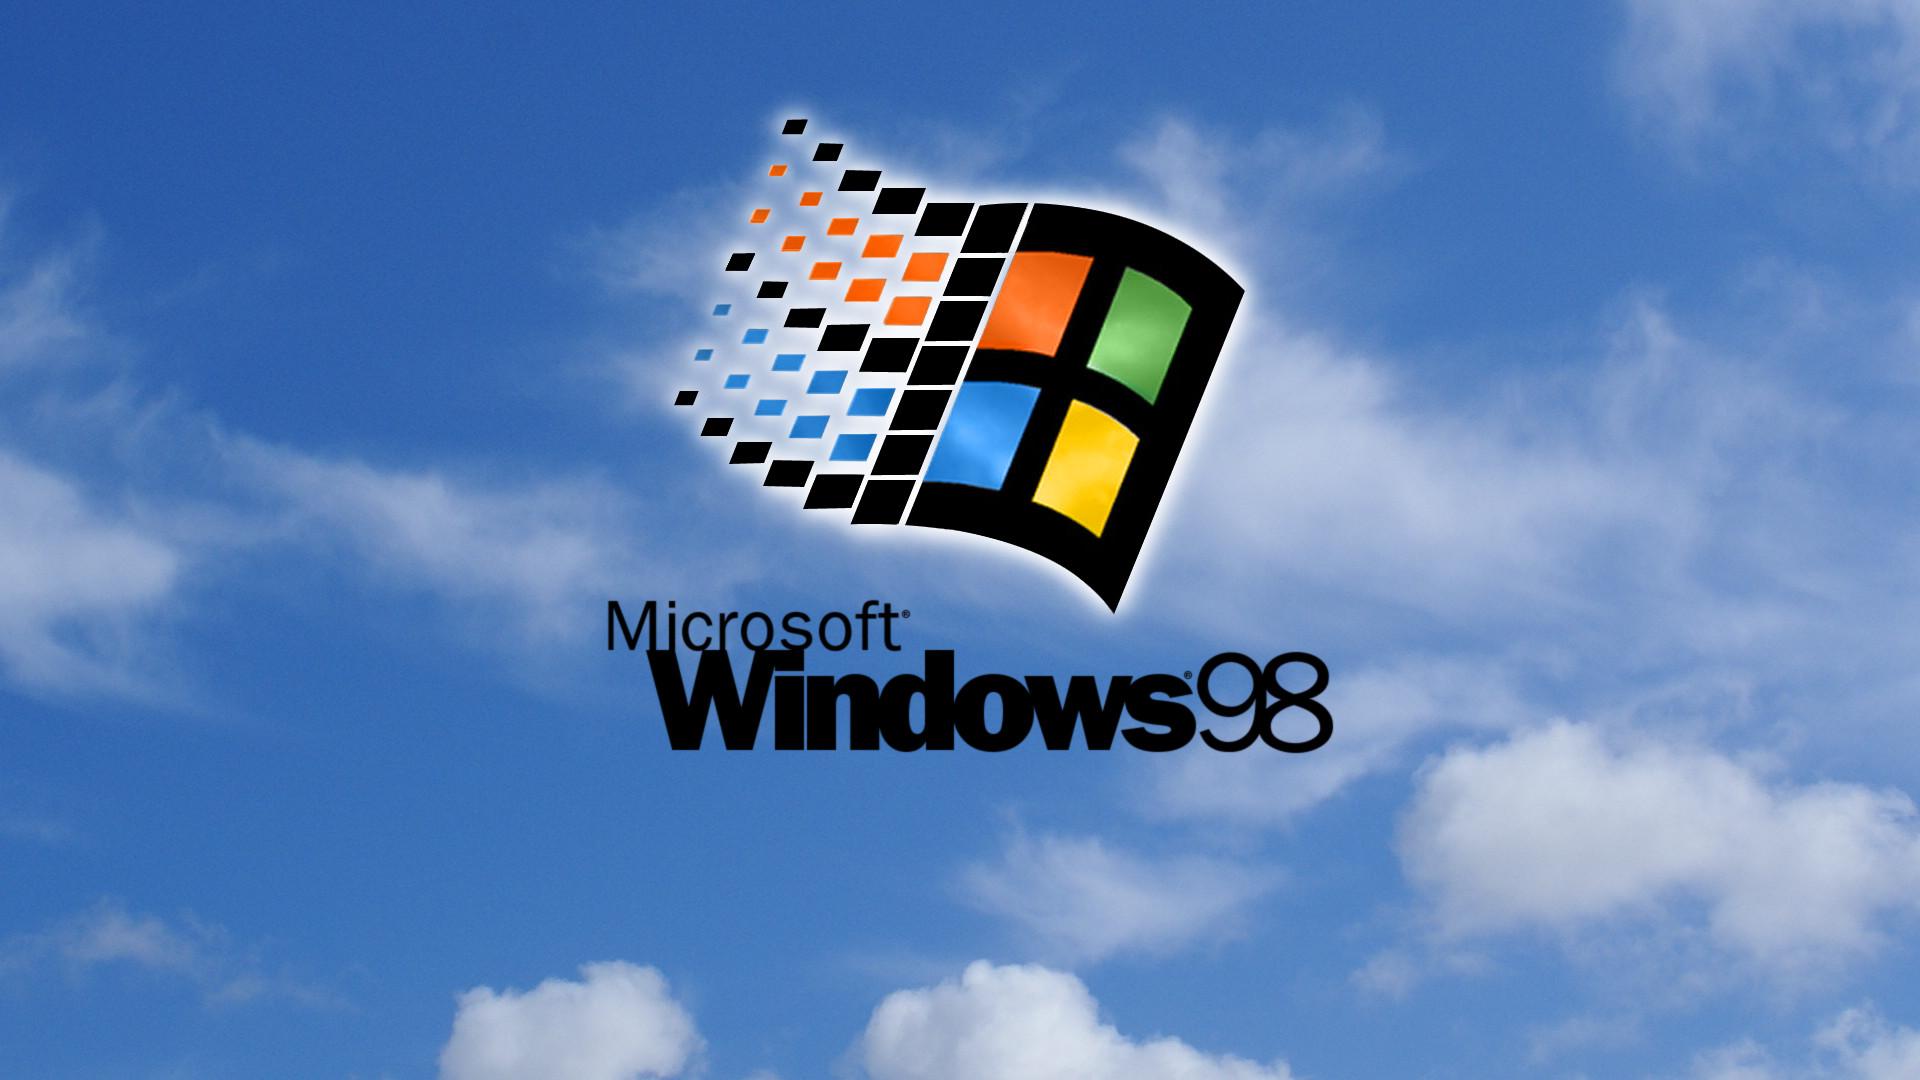 Windows Me Wallpaper ·① WallpaperTag